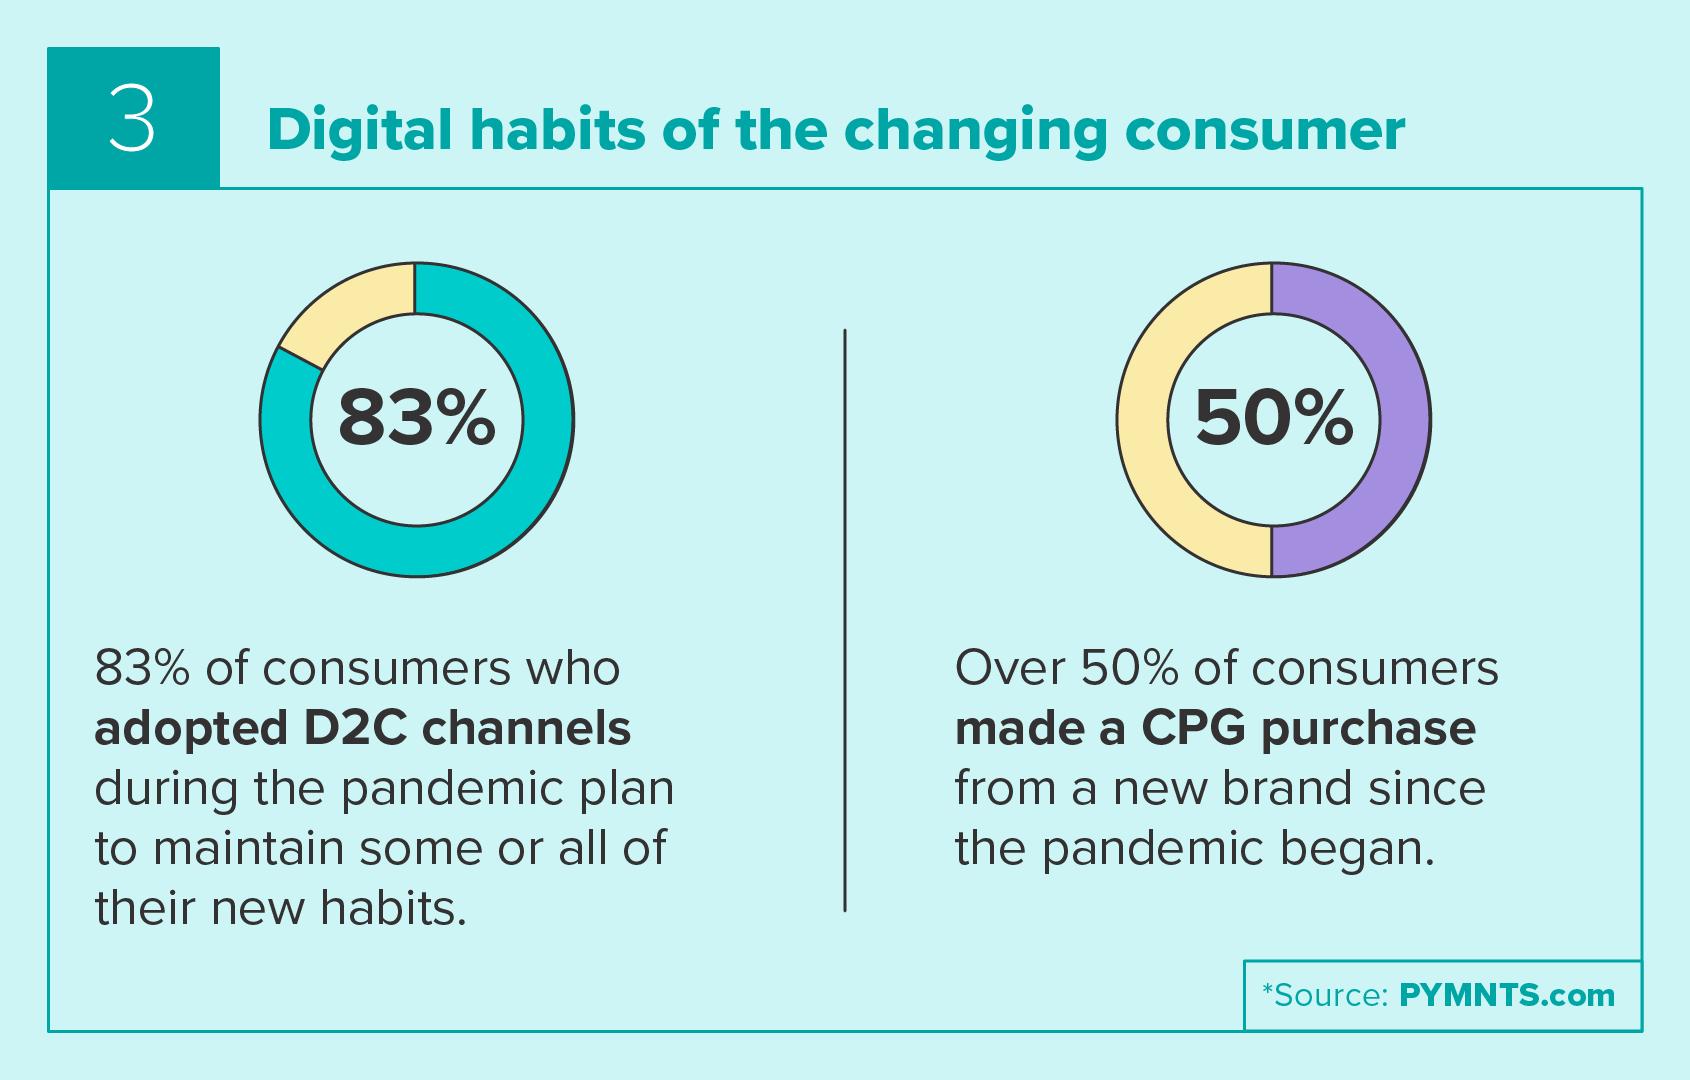 Consumer digital habits